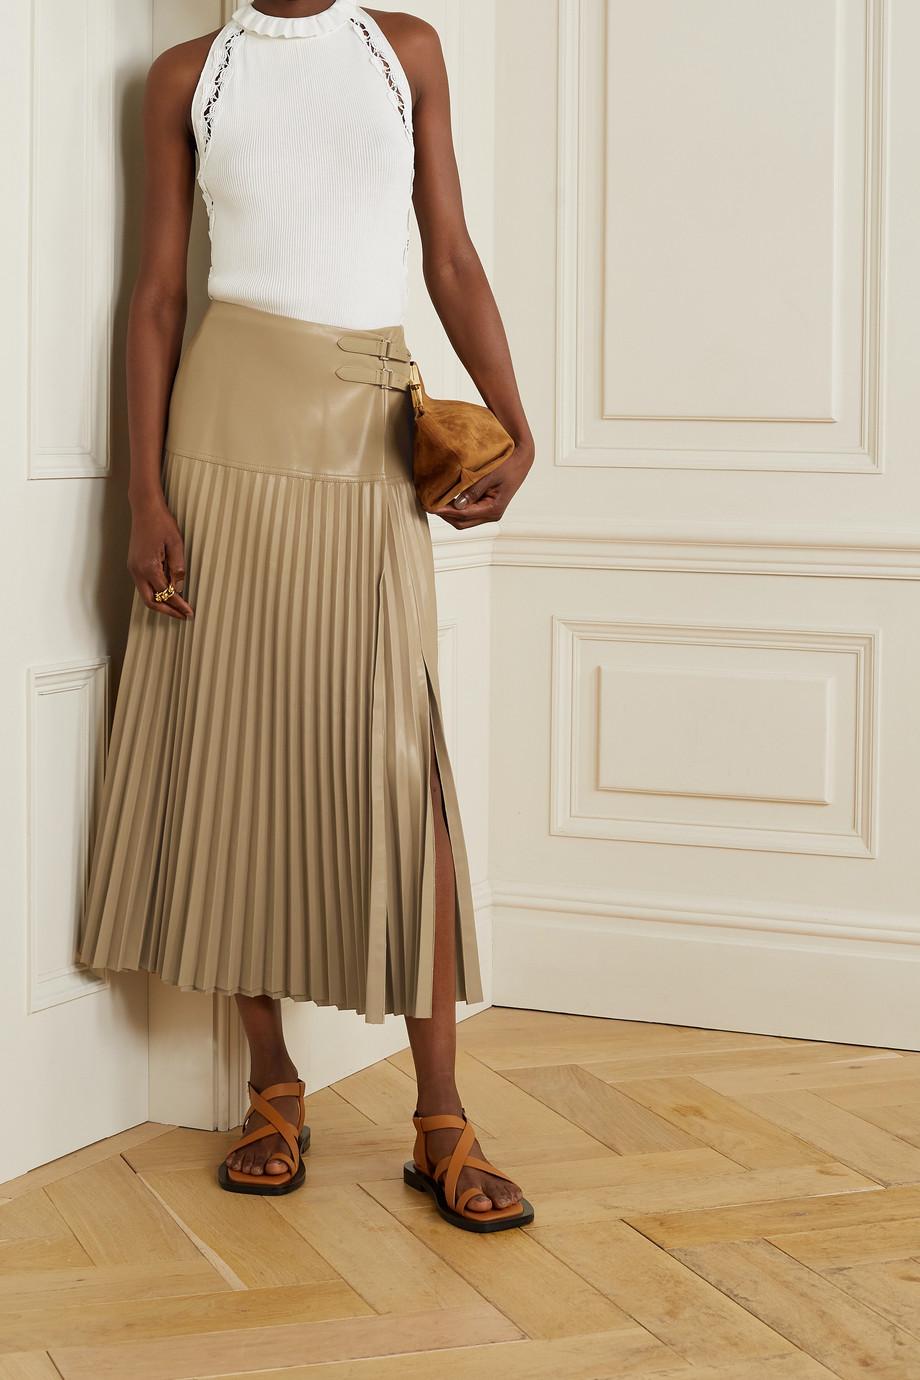 Jonathan Simkhai Jupe midi portefeuille en cuir vegan à plis Leona